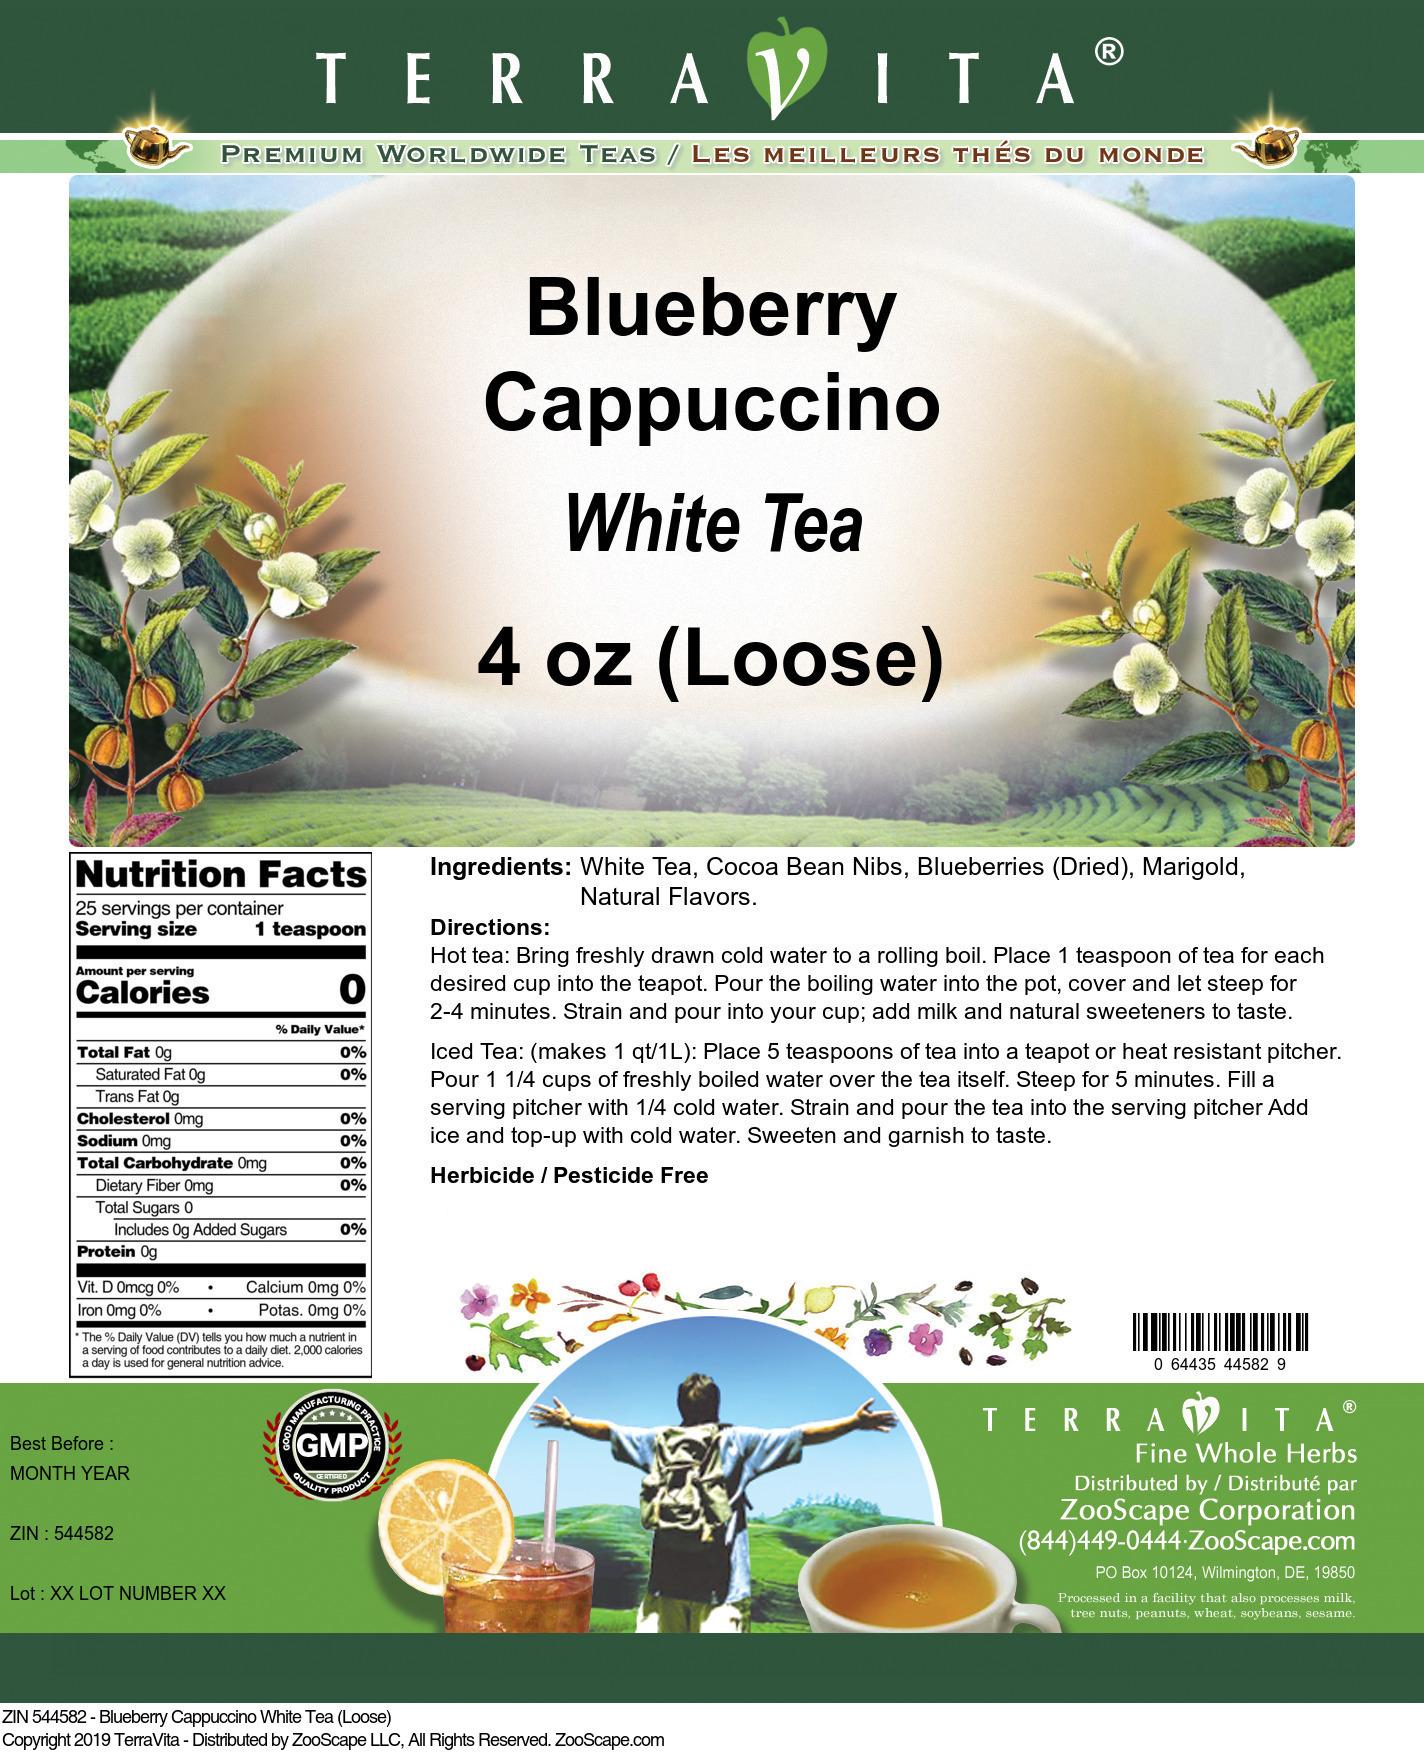 Blueberry Cappuccino White Tea (Loose)